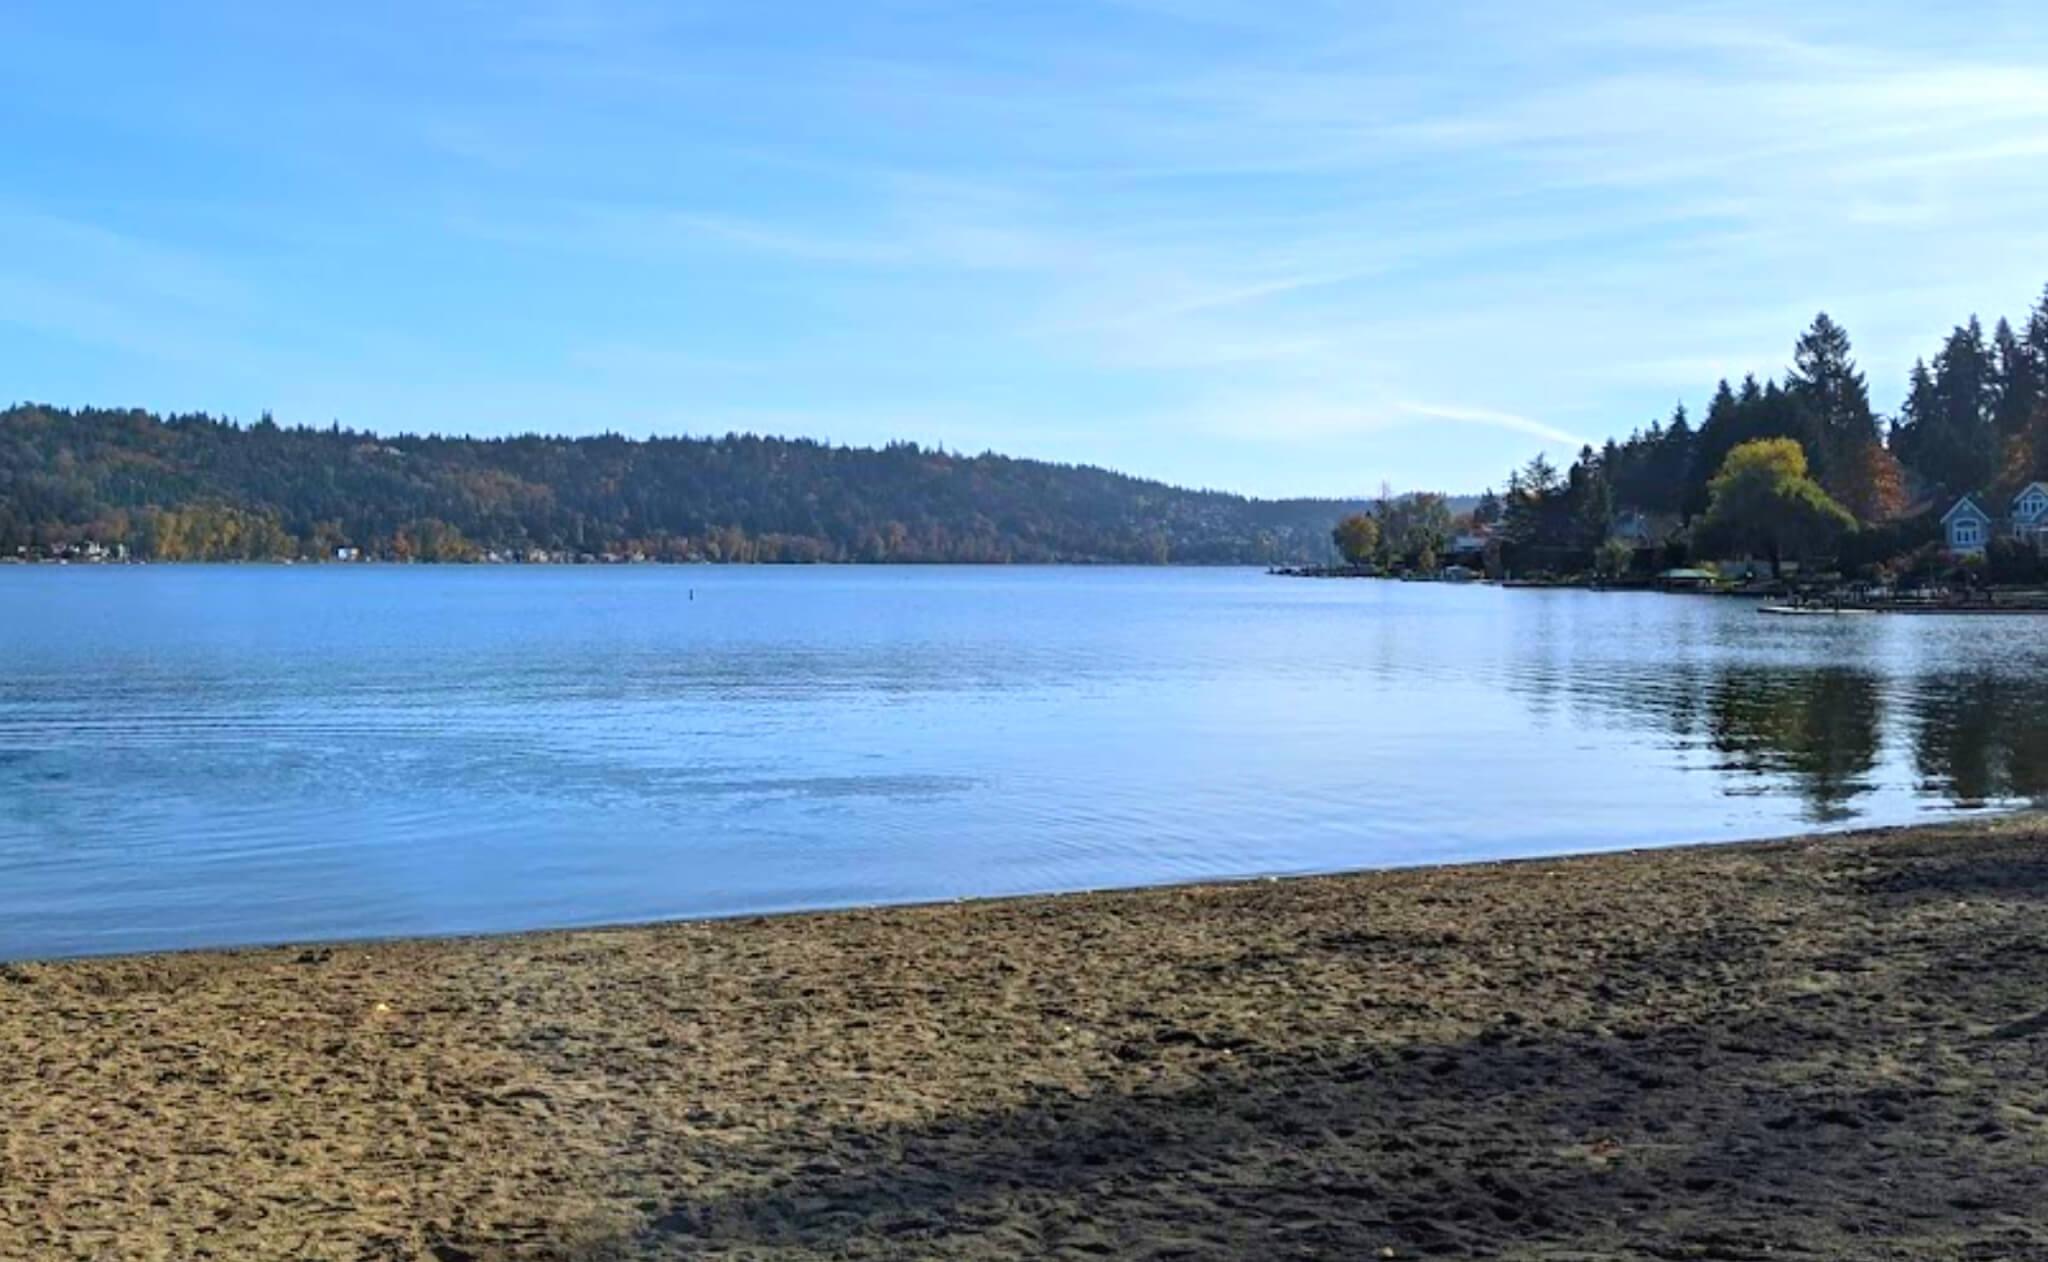 Sammamish-Lake-Fishing-Report-Guide-Washington-WA-03